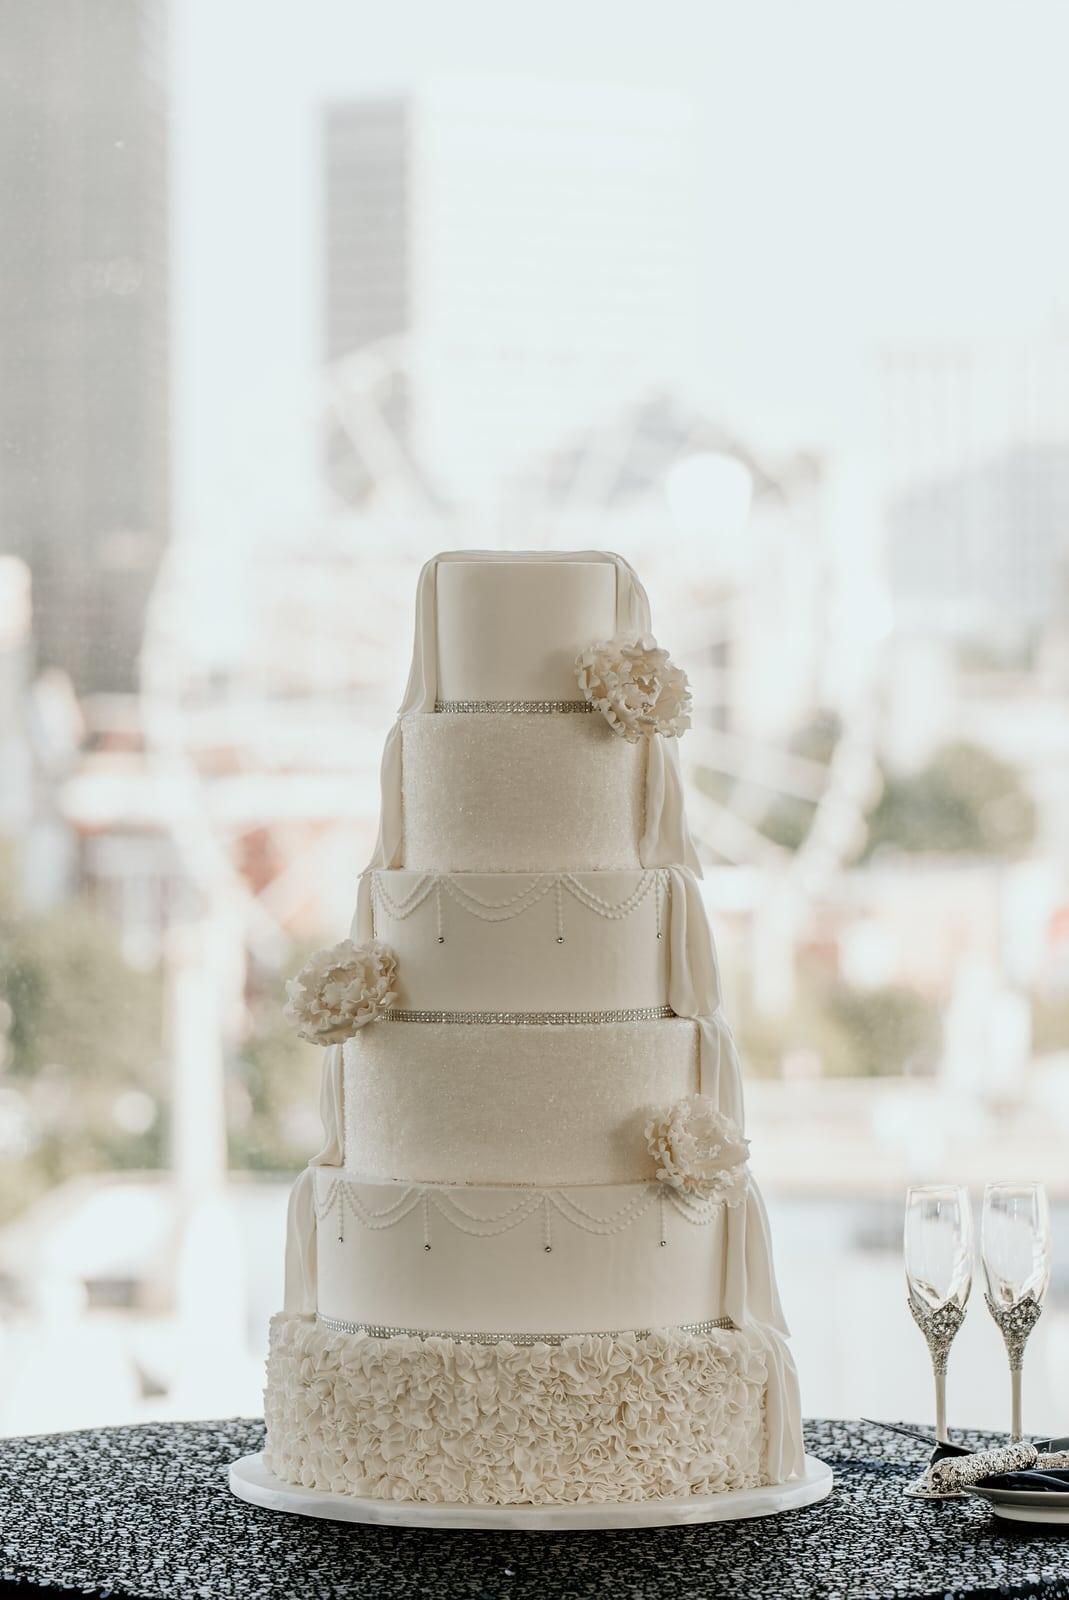 Draped wedding cake with Skyview Atlanta ferris wheel in the background